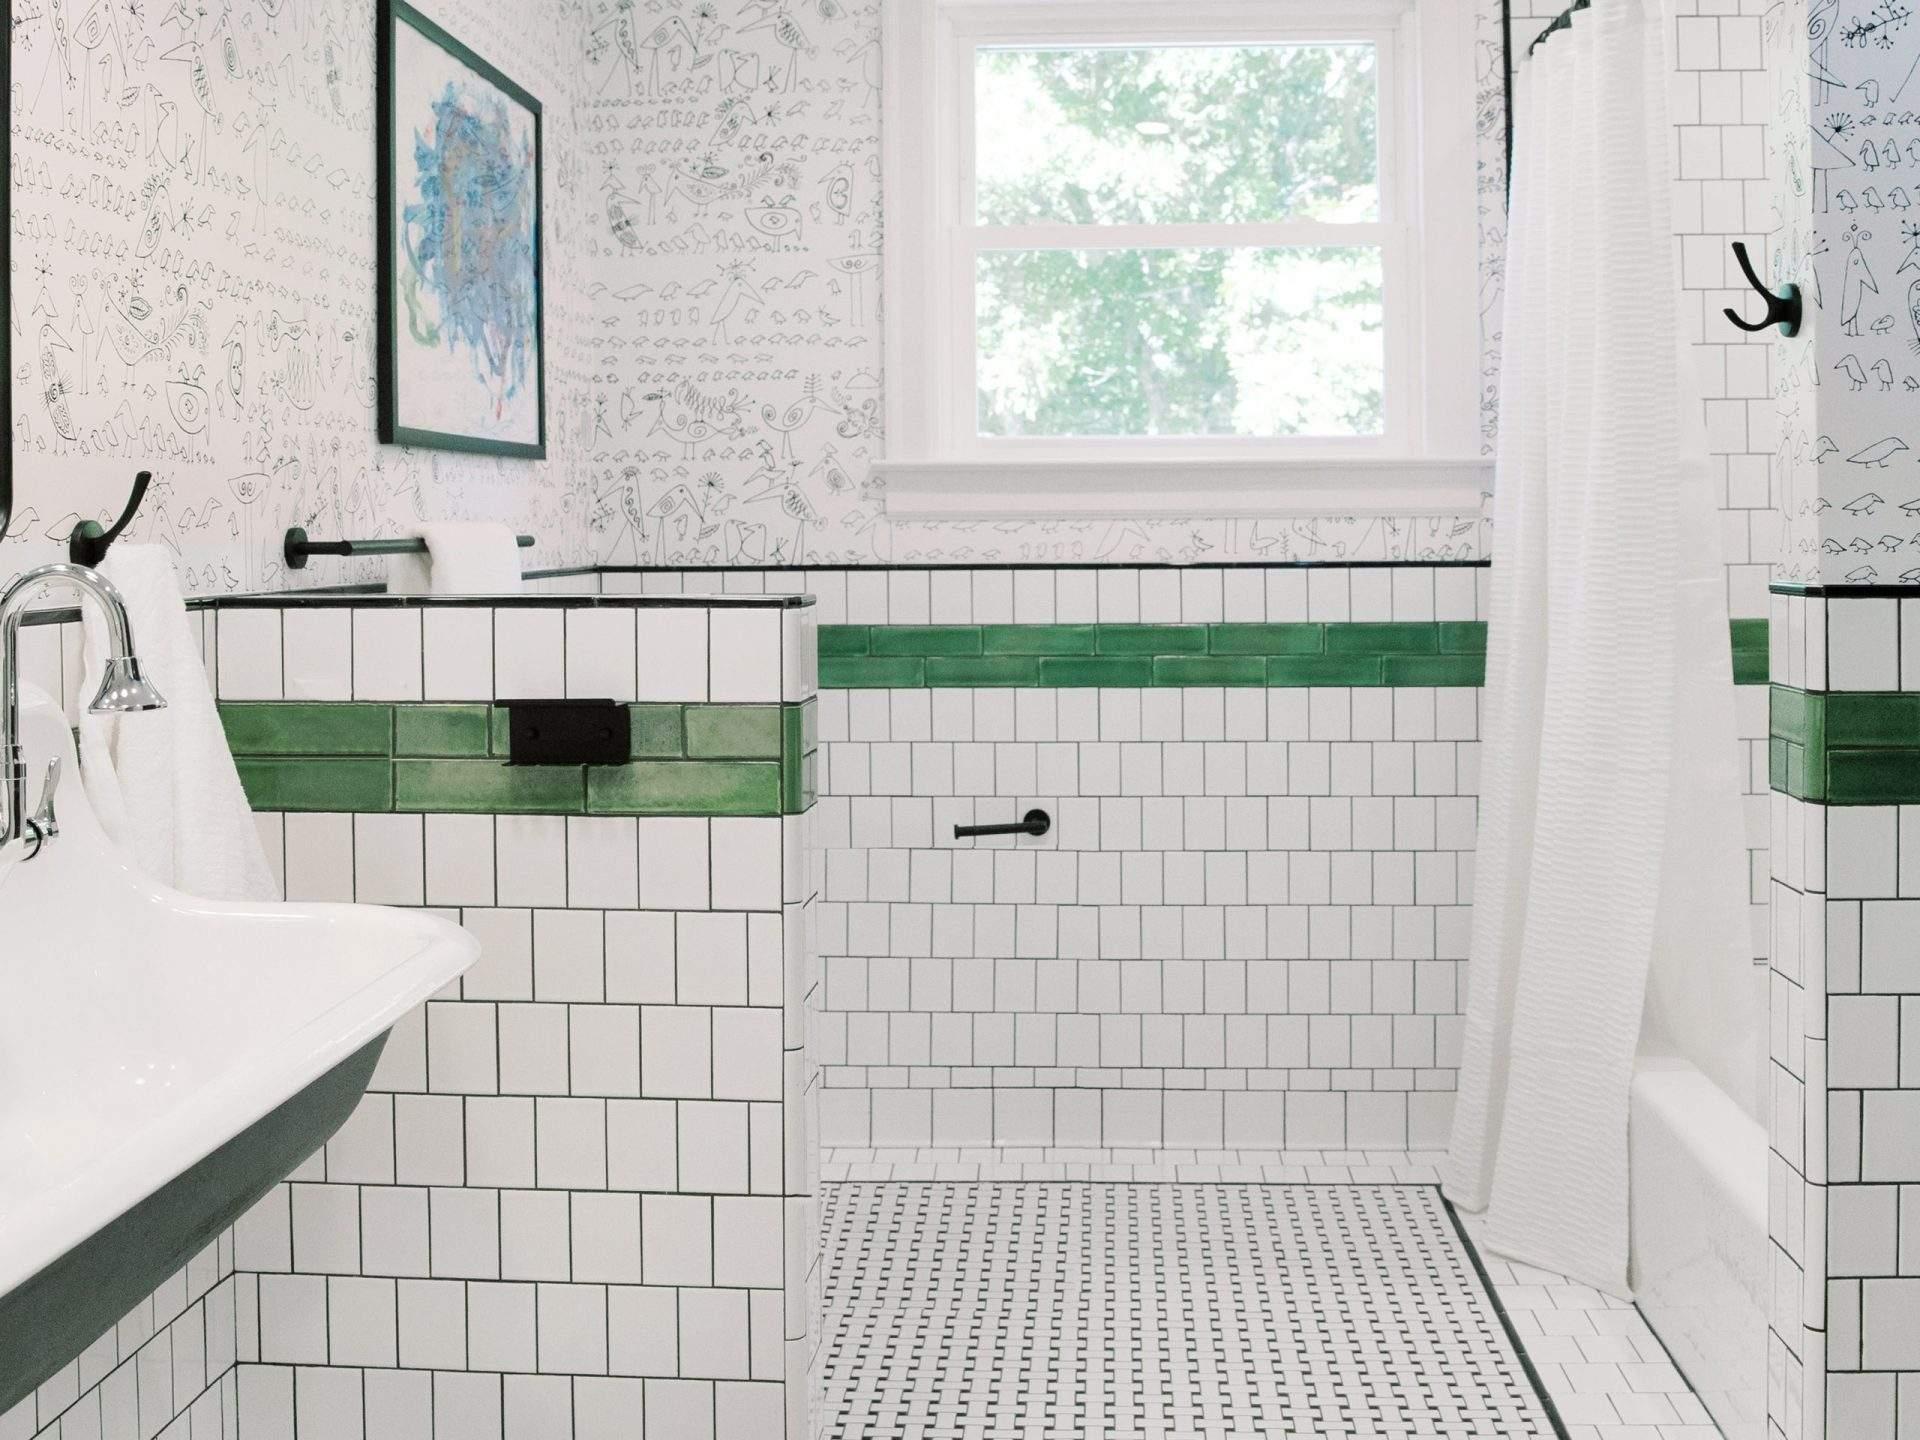 Bathroom Interior Design, White Tile with Green Border, Etch Interior Design, Austin, Texas